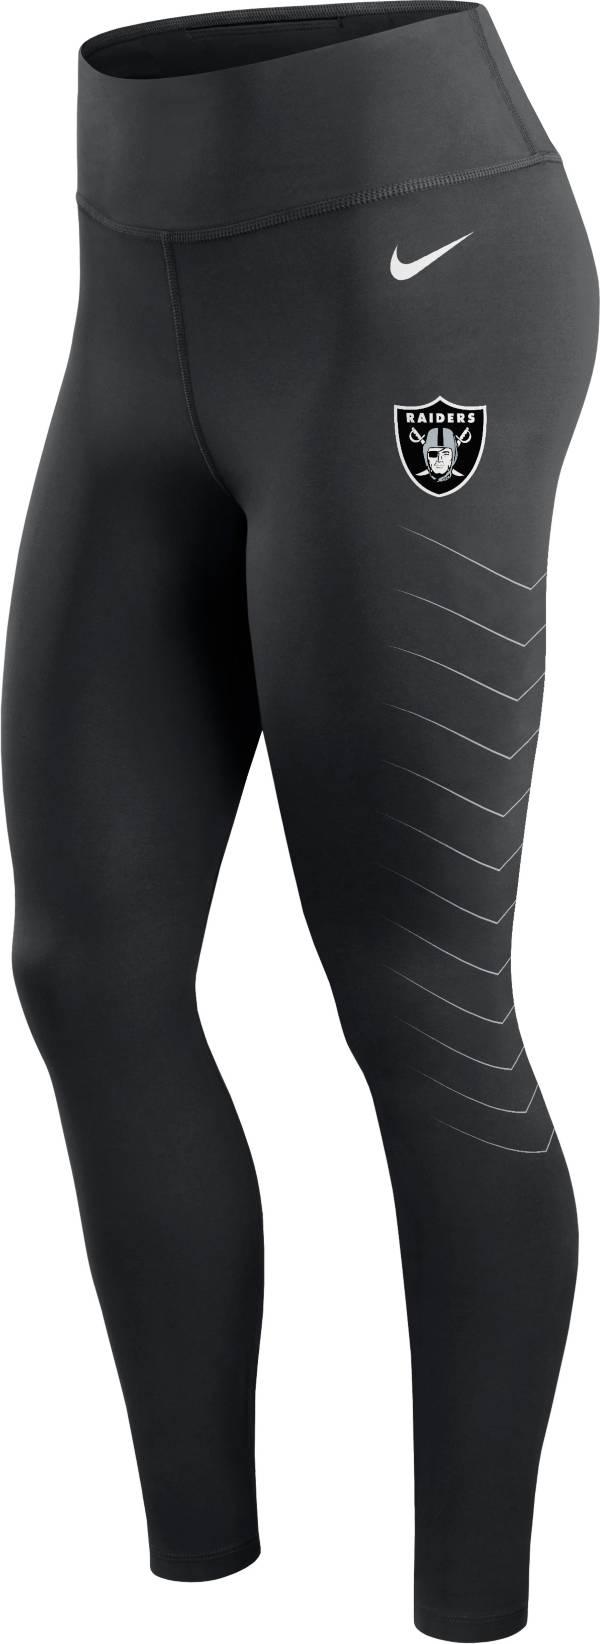 Nike Women's Las Vegas Raiders Dri-FIT Black Performance Leggings product image